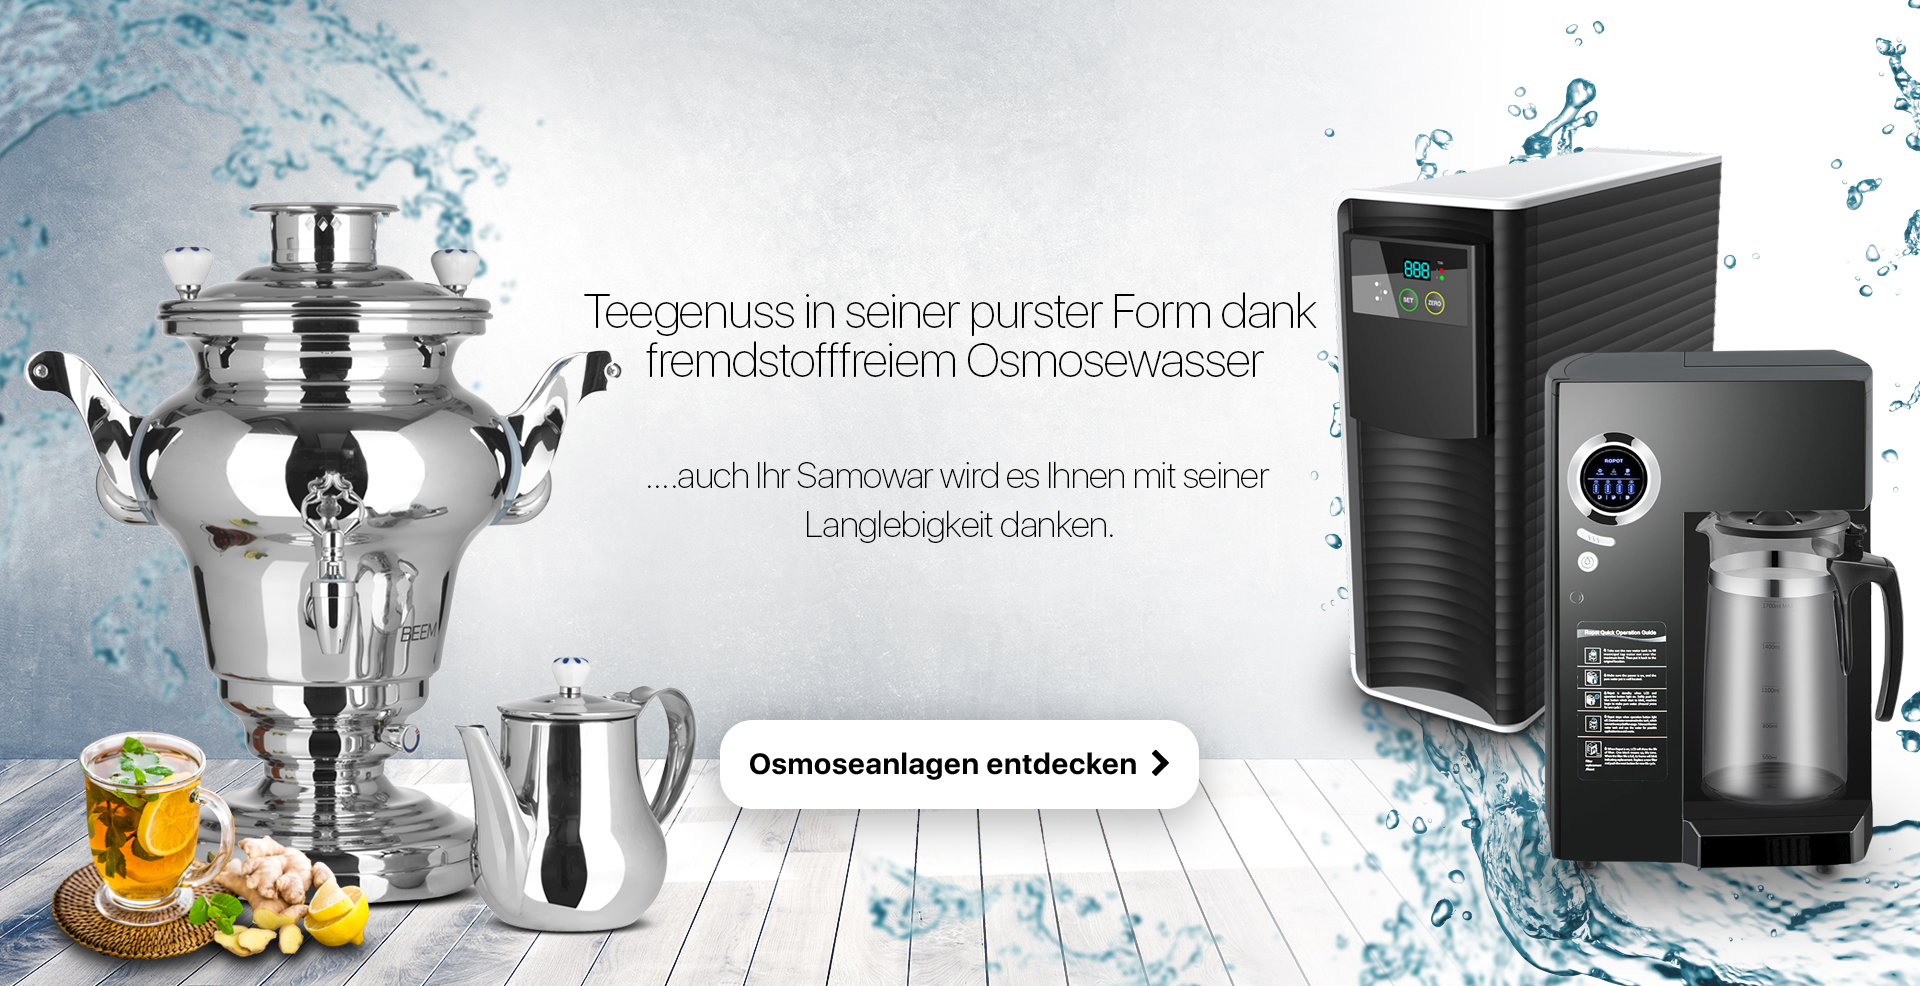 Osmosewasser_ohne-Samoware_06129